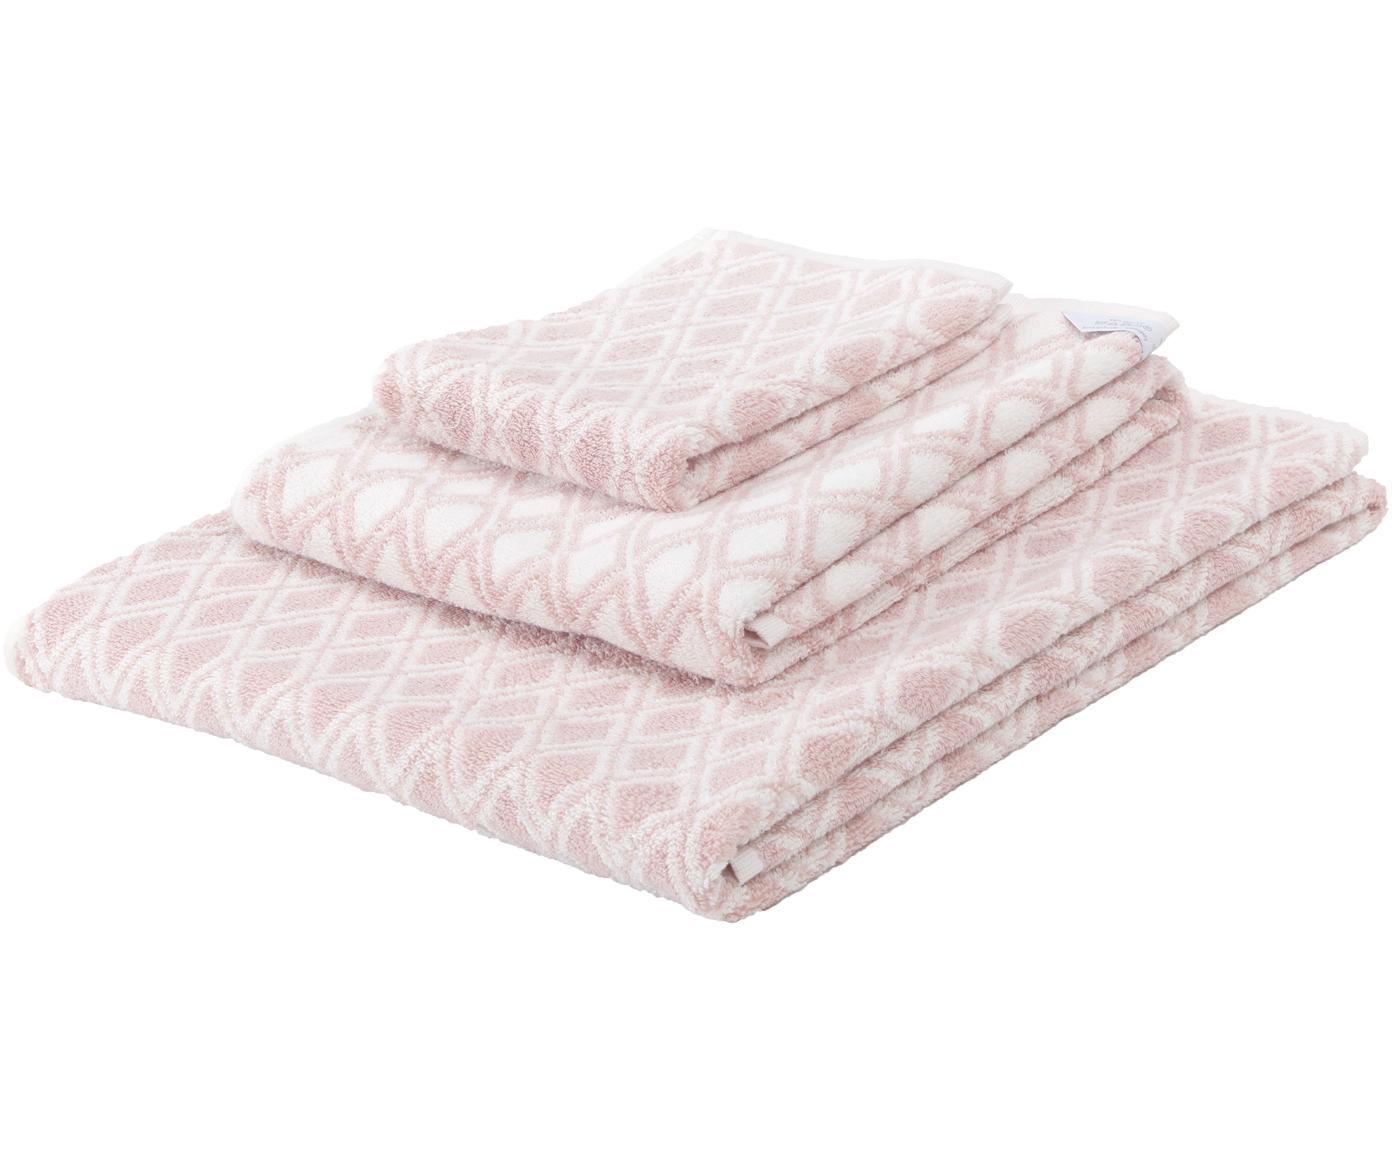 Set asciugamani reversibili Ava 3 pz, Rosa, crema, Diverse dimensioni